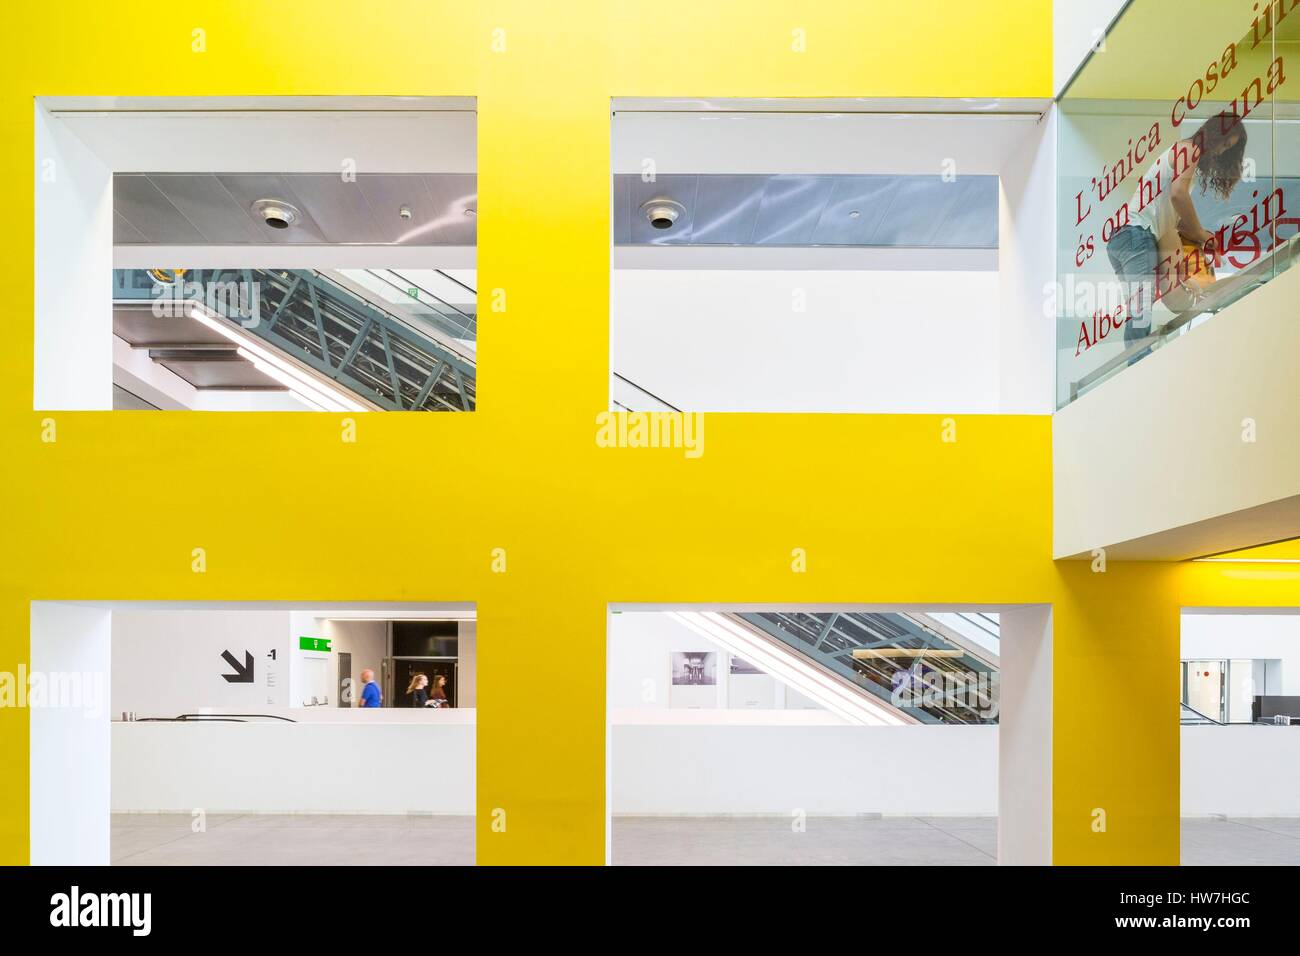 Spanien, Katalonien, Barcelona, Plaça de les Glories Catalanes, Museu Del Disseny, das Design Museum beherbergt Stockbild